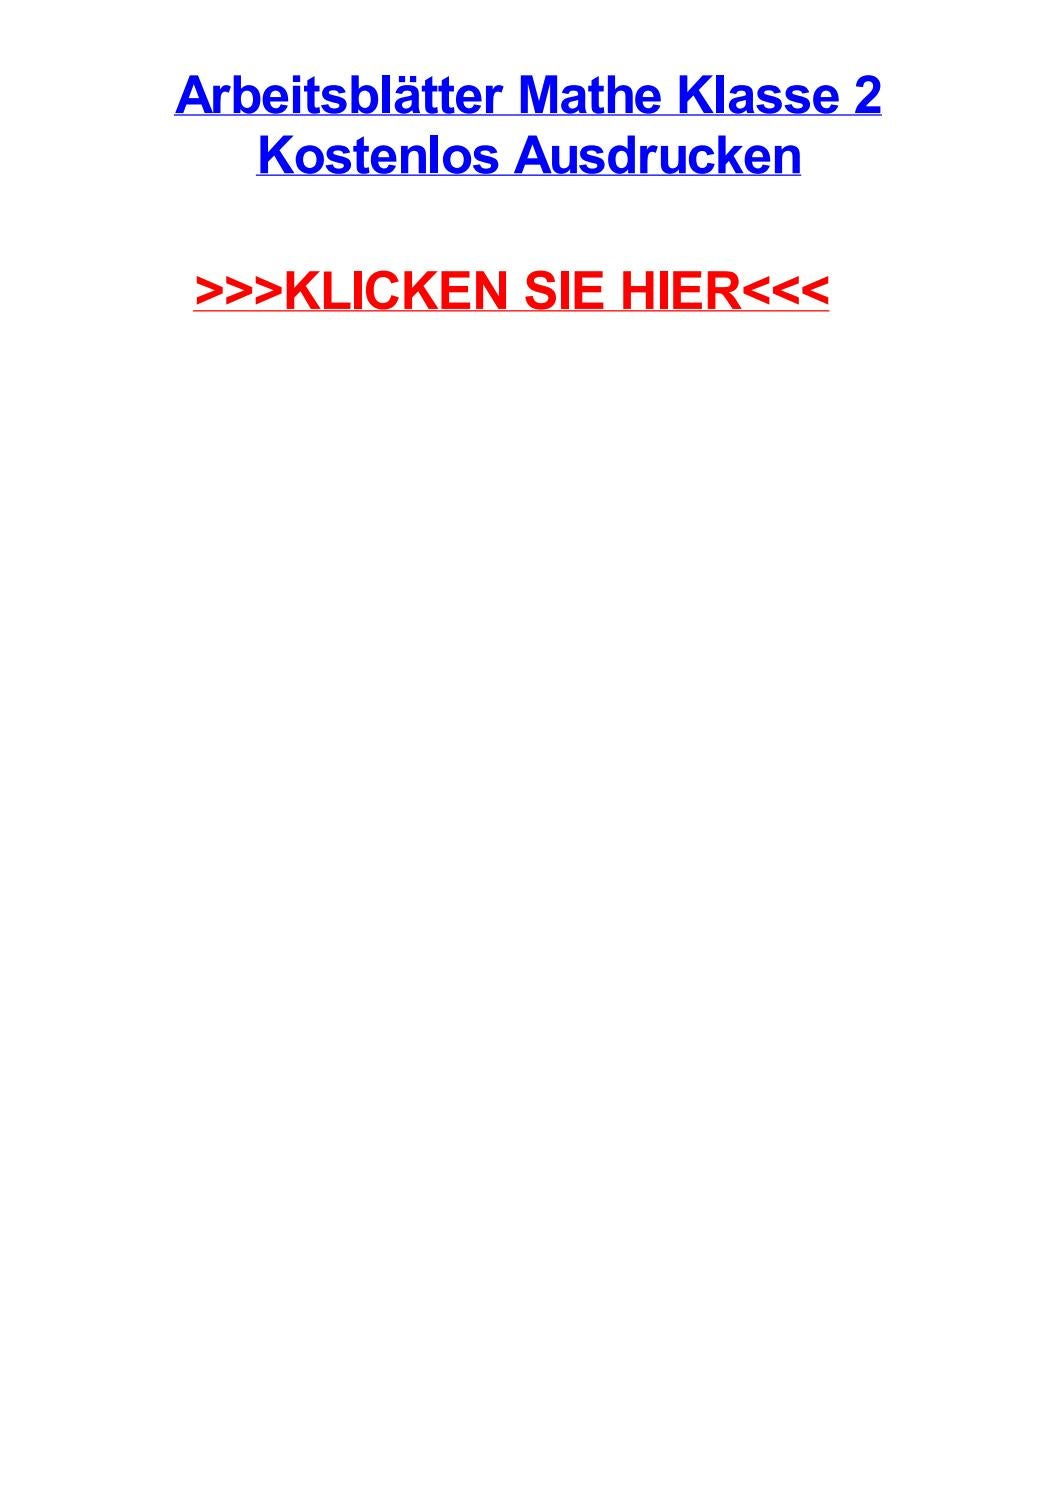 Charmant Mathe Danksagung Arbeitsblatt Galerie - Gemischte Übungen ...